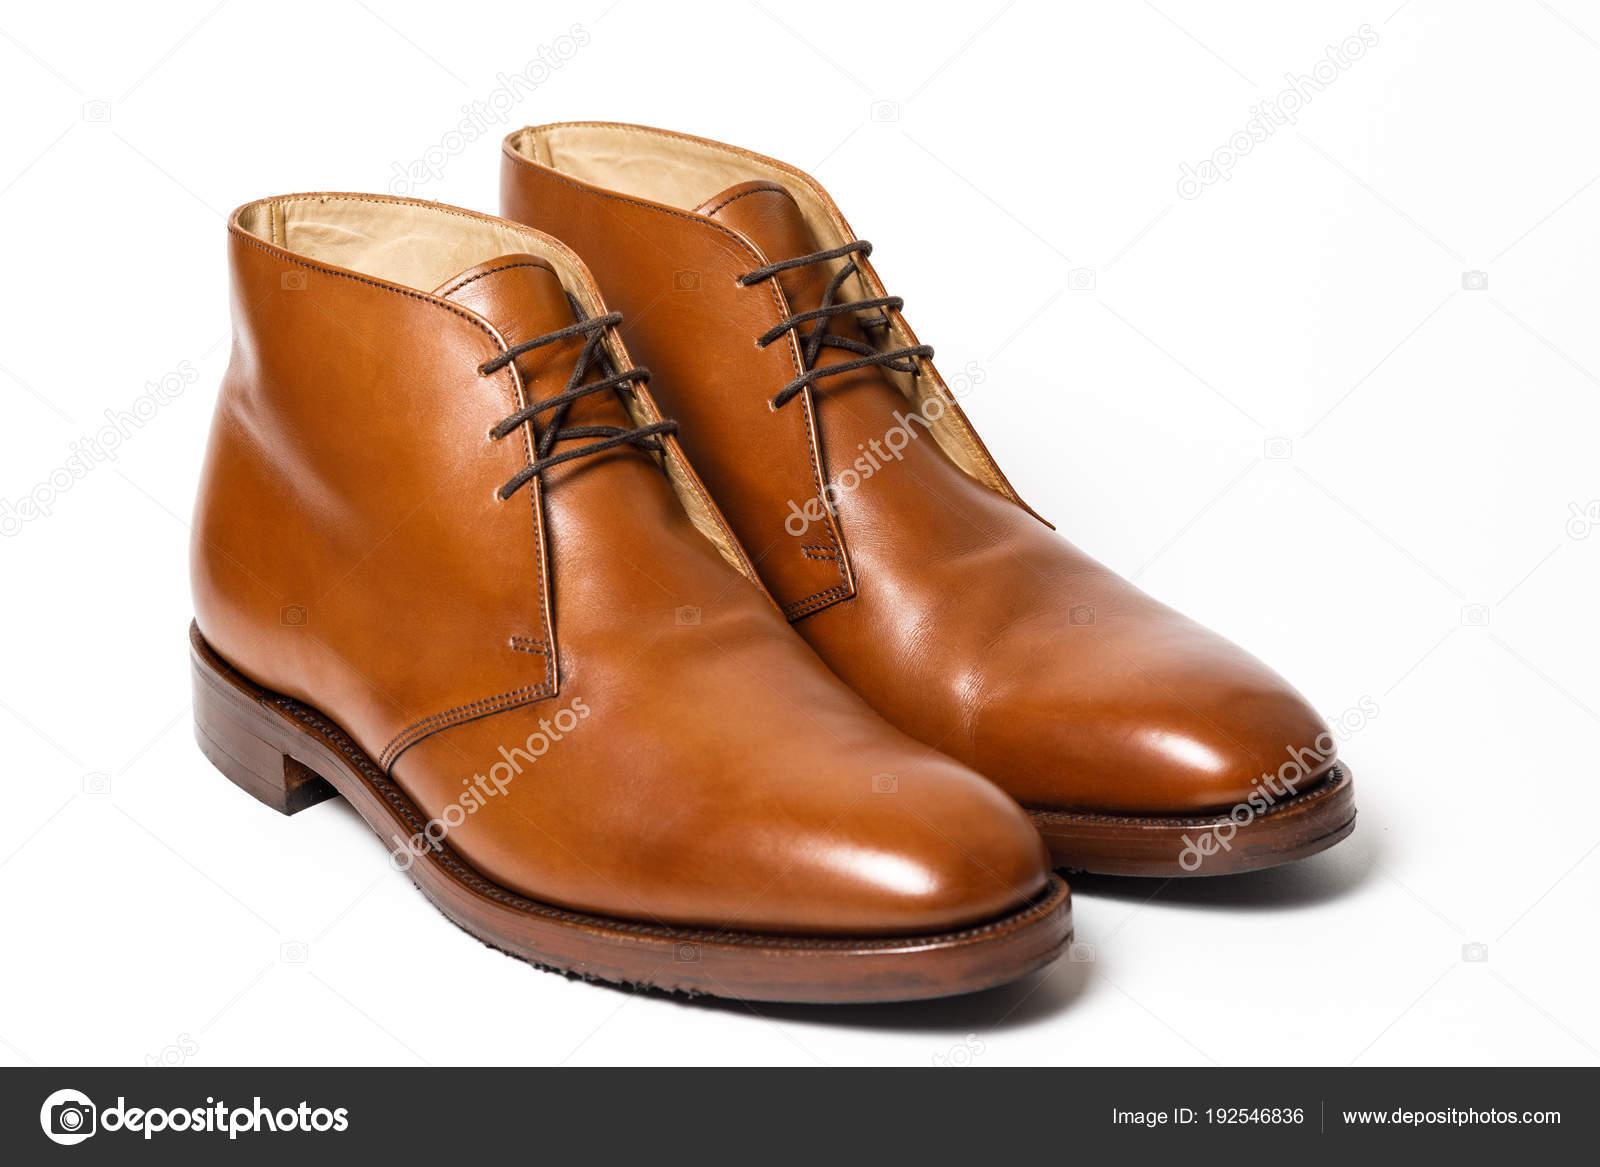 Bxd6z7vq Sobre Zapatos Aislados Clásico De Fondo Marrón Hombre Cuero azqpW78